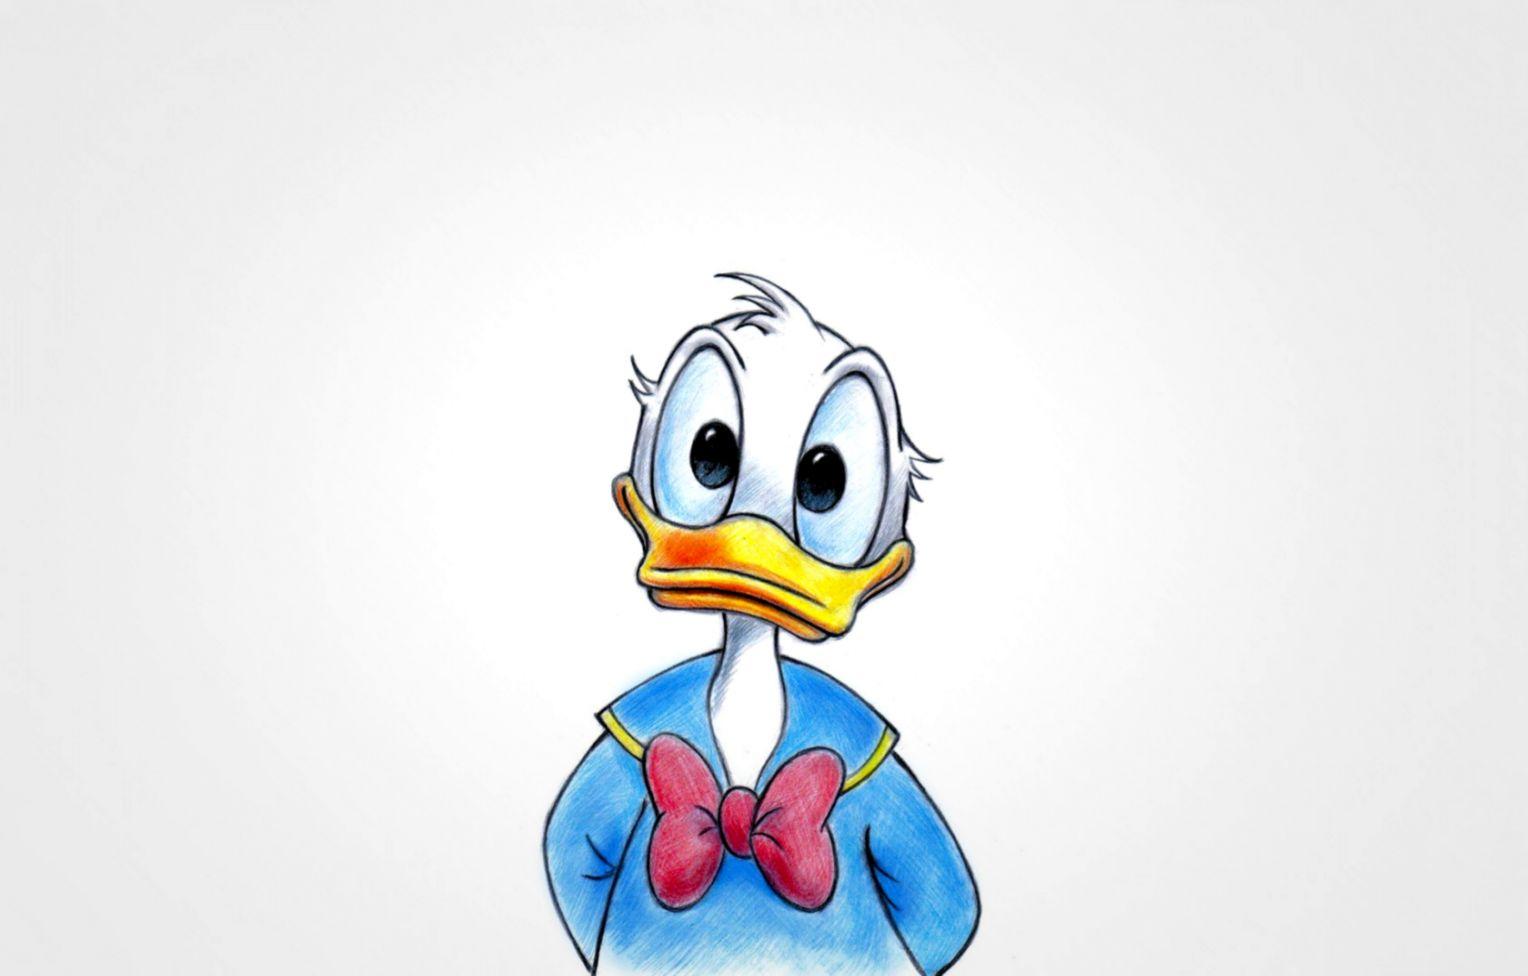 artwork Donald Duck Walt Disney Animals Wallpapers HD Desktop